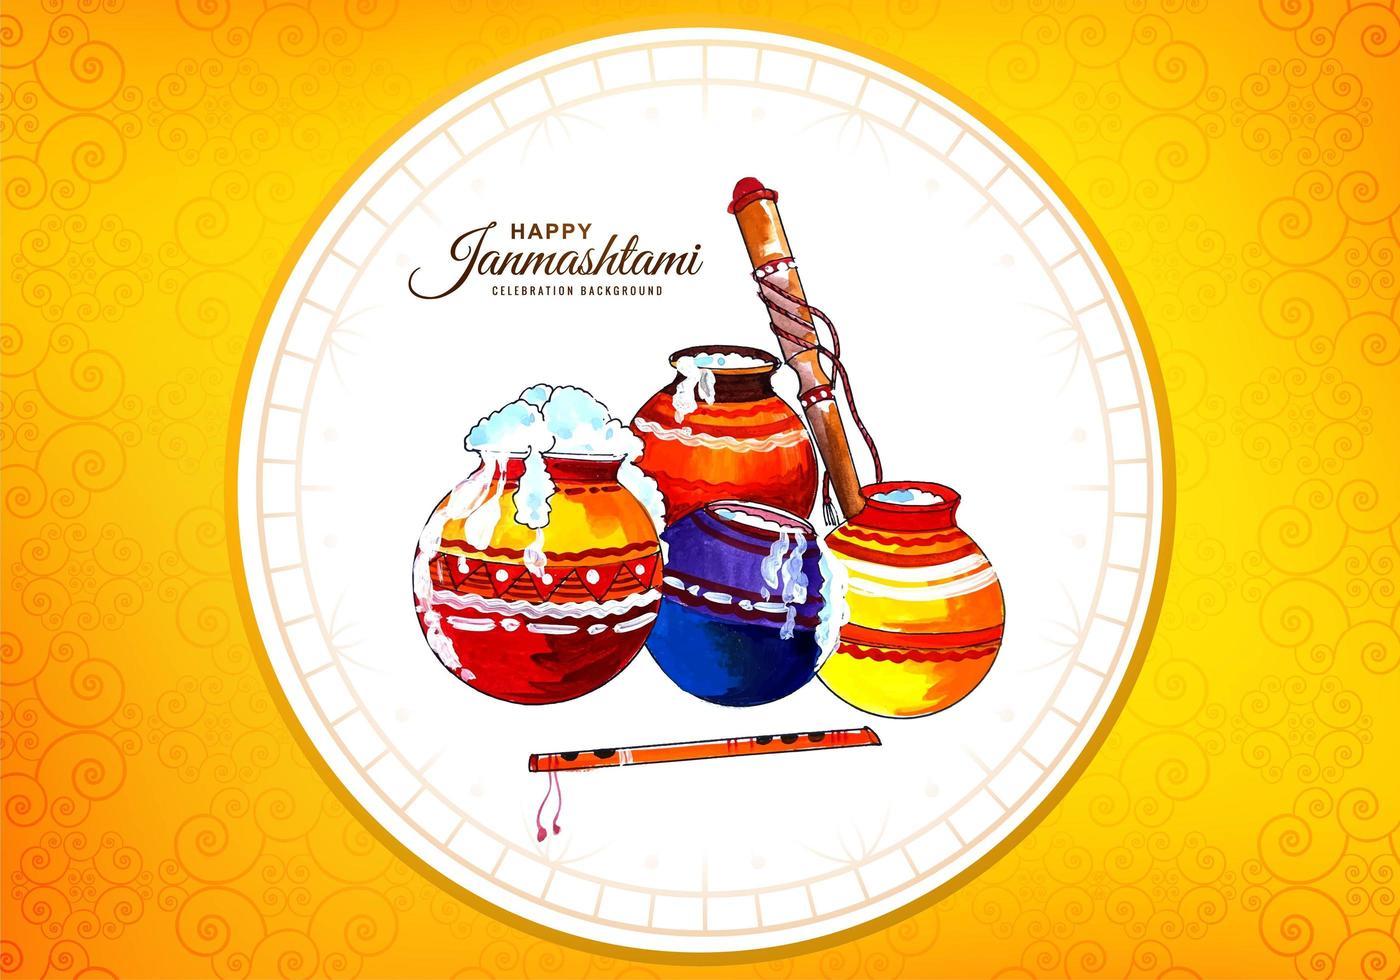 macetas de krishna feliz en marco de círculo tarjeta de festival de janmashtami vector